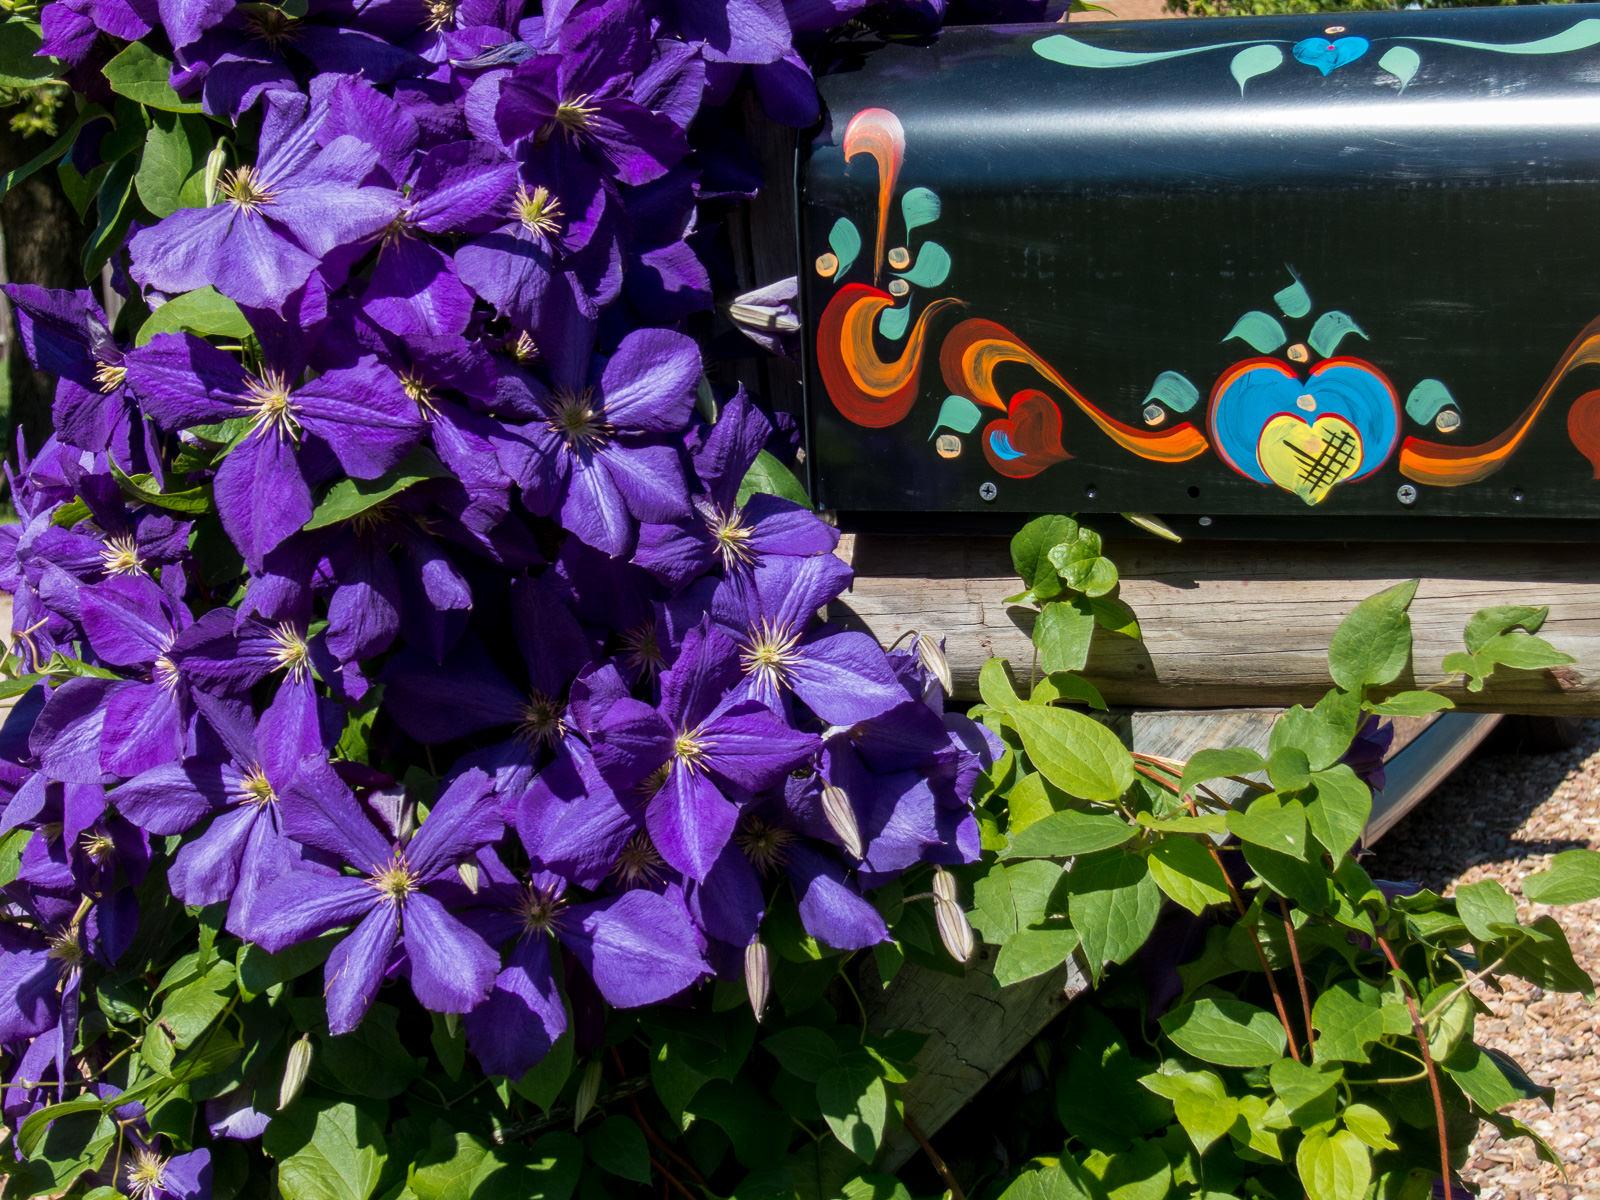 lindsborg-flowers-jun15-1